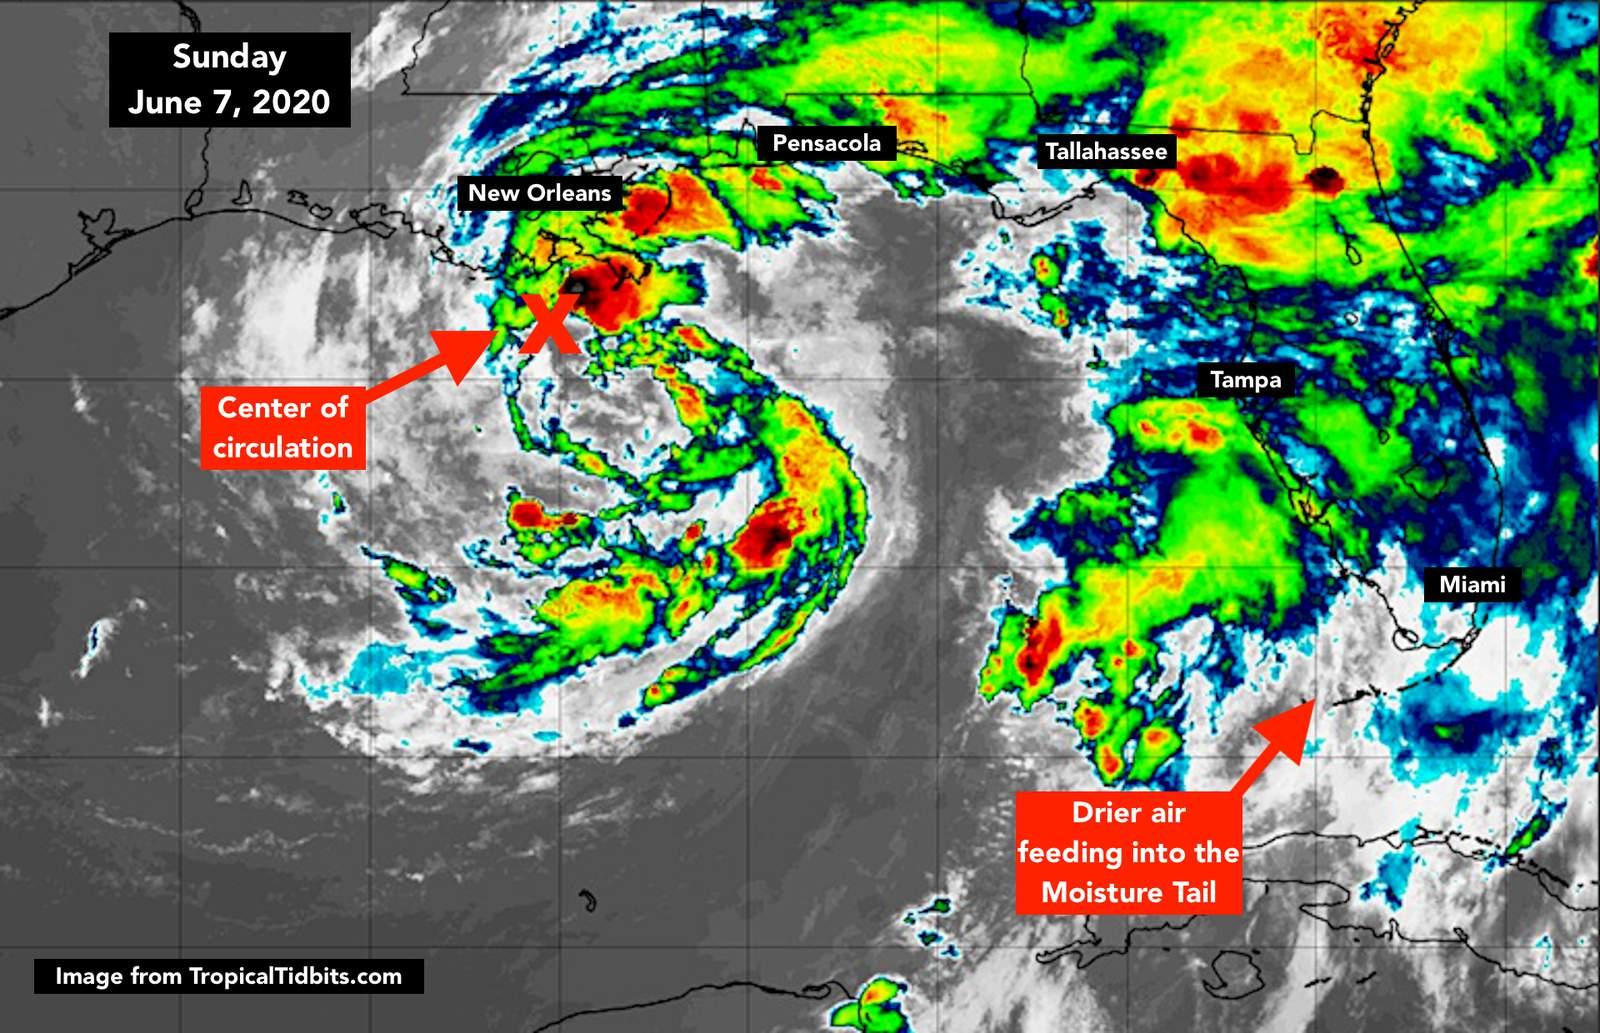 National Hurricane Center Says Tropical Storm Cristobal Has Made Landfall On Southeast Louisiana Coast